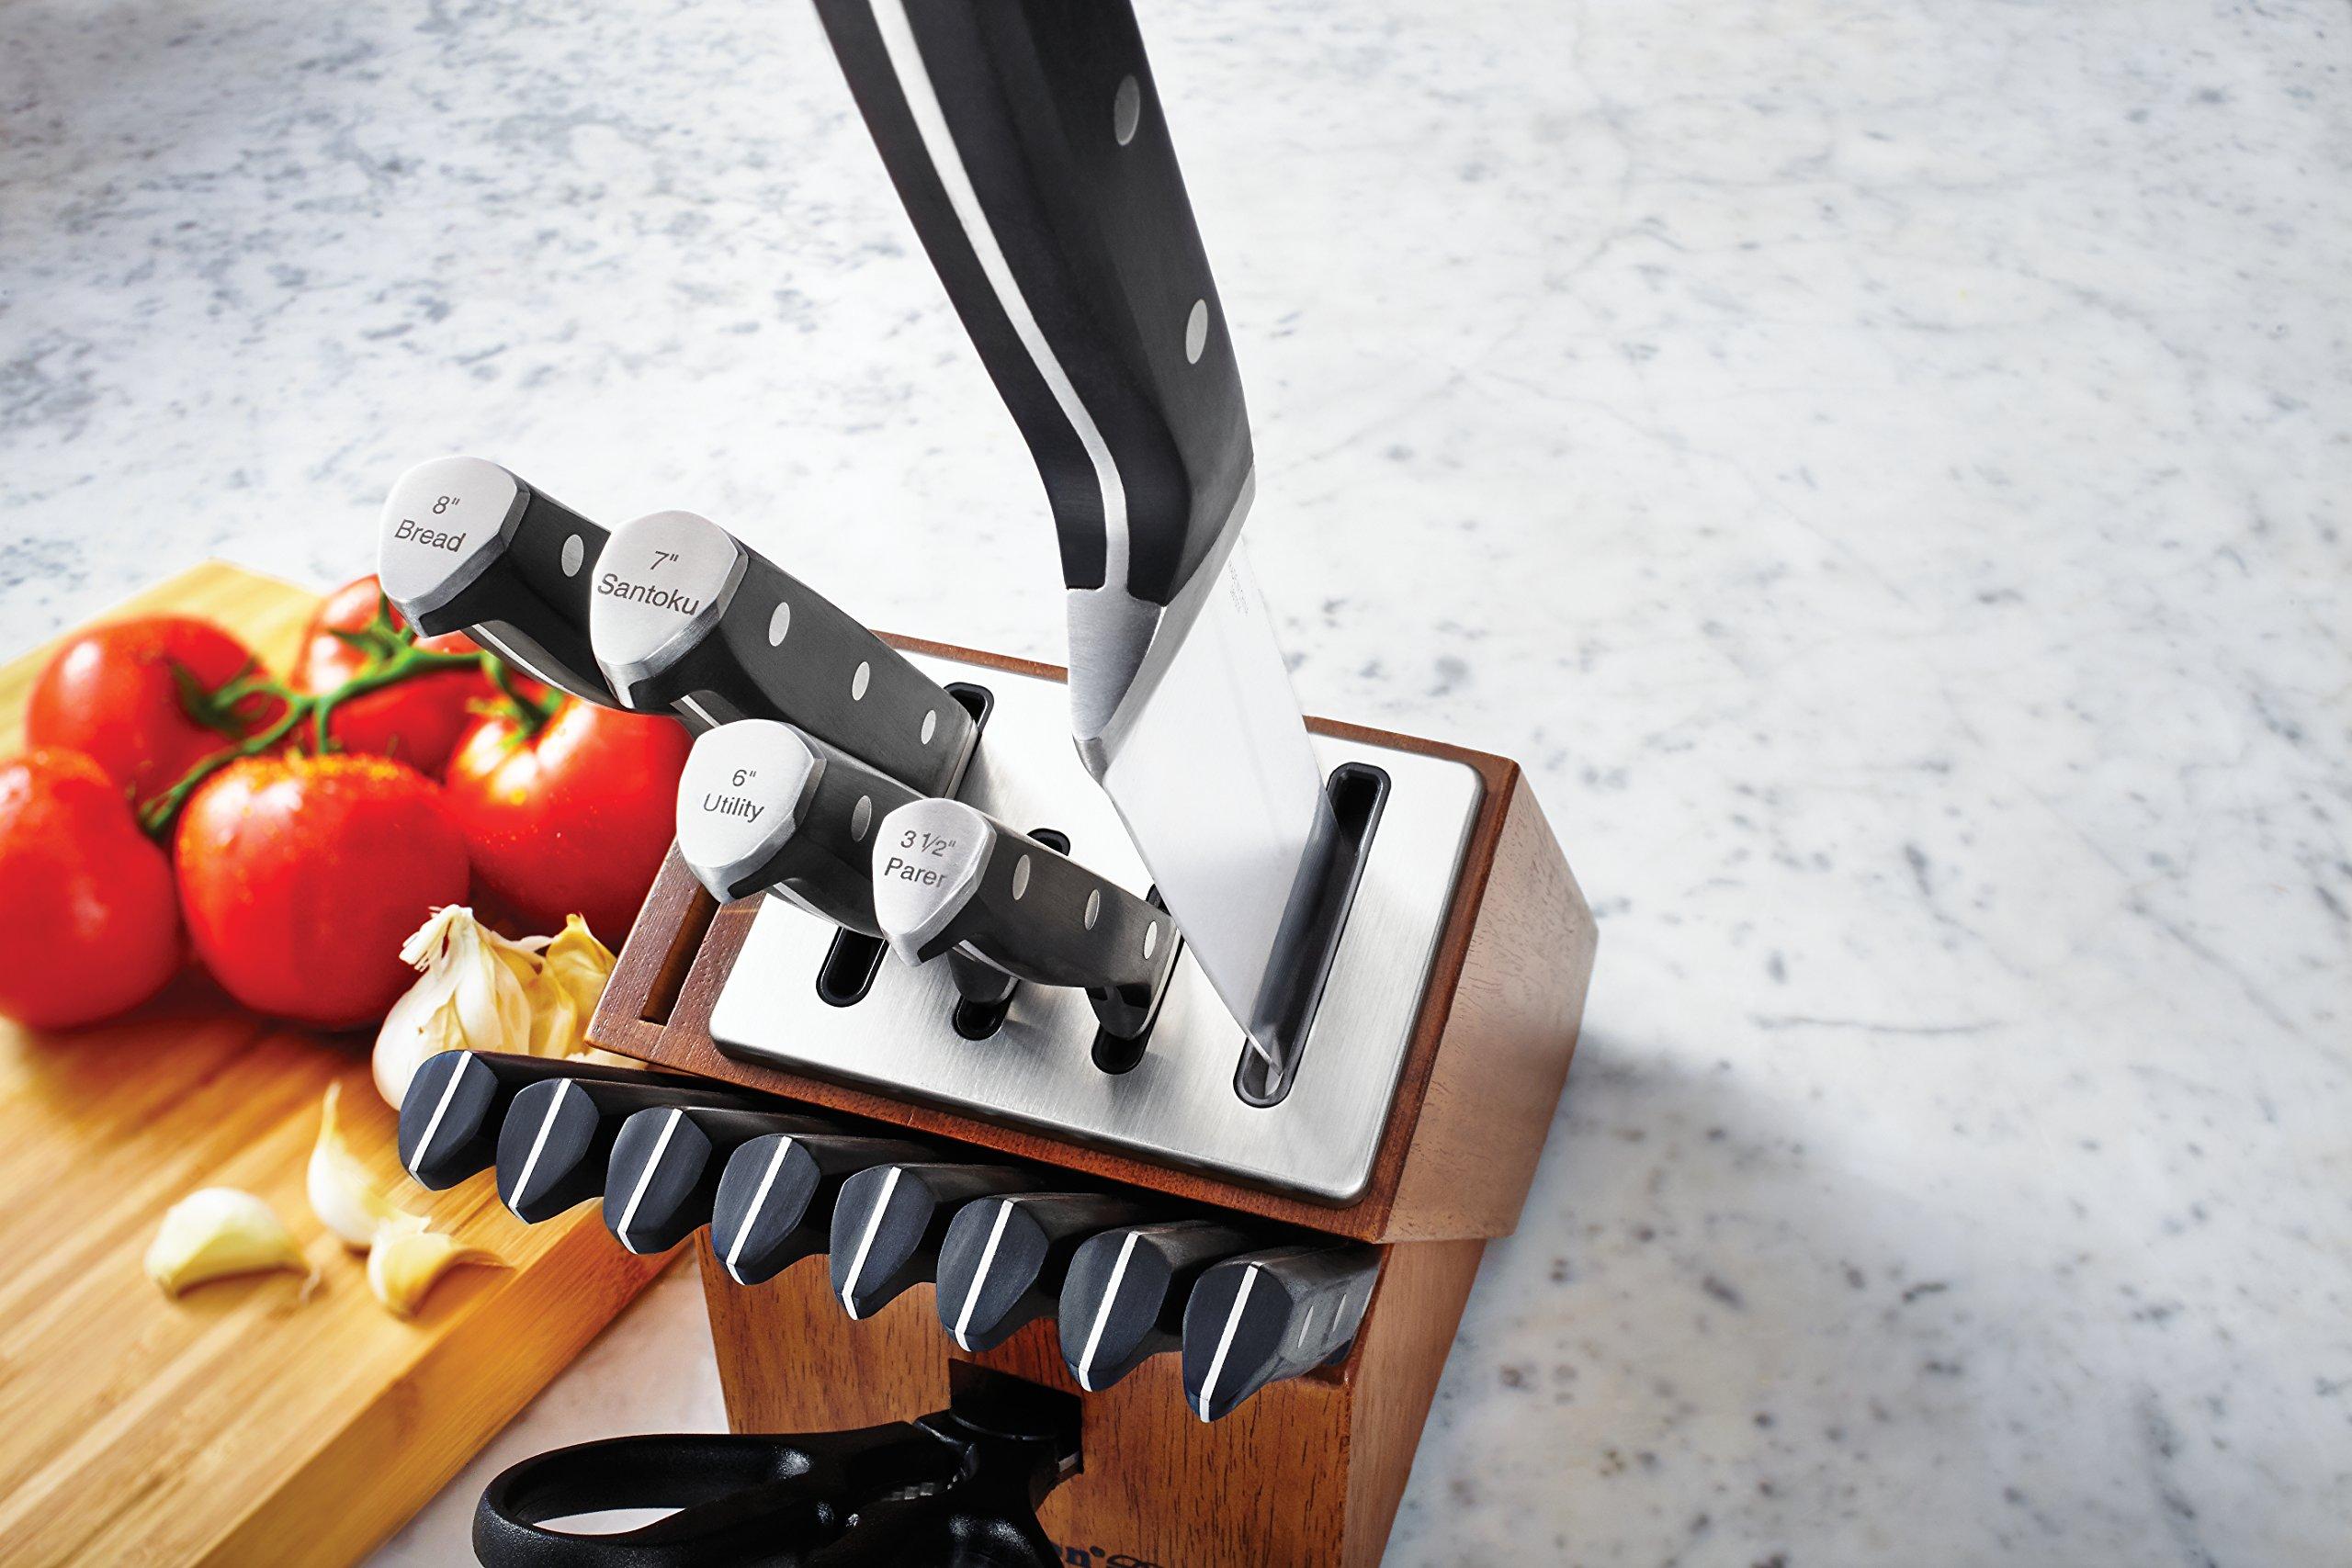 Calphalon Classic Self-Sharpening 15-pc. Cutlery Knife Block Set by Calphalon (Image #4)